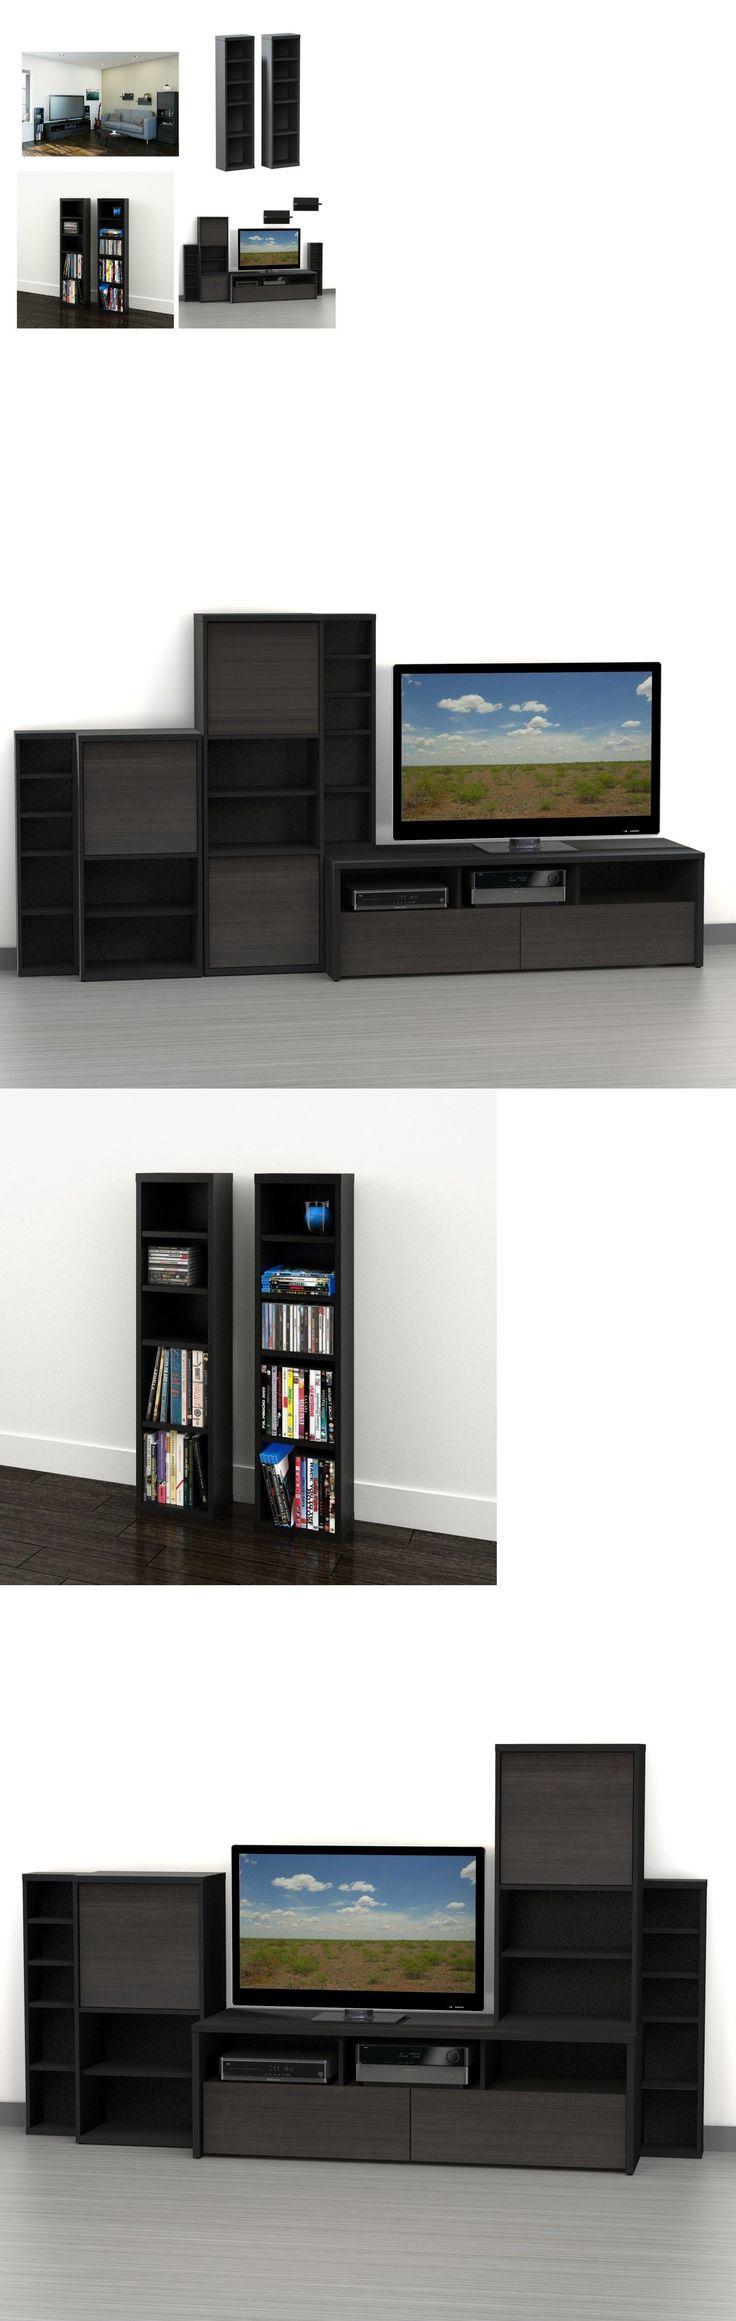 CD and Video Racks 22653: 2 Multimedia Storage Cd Organizer Dvd Tower Rack Cabinet Movie Shelf Stand Media -> BUY IT NOW ONLY: $97.08 on eBay!